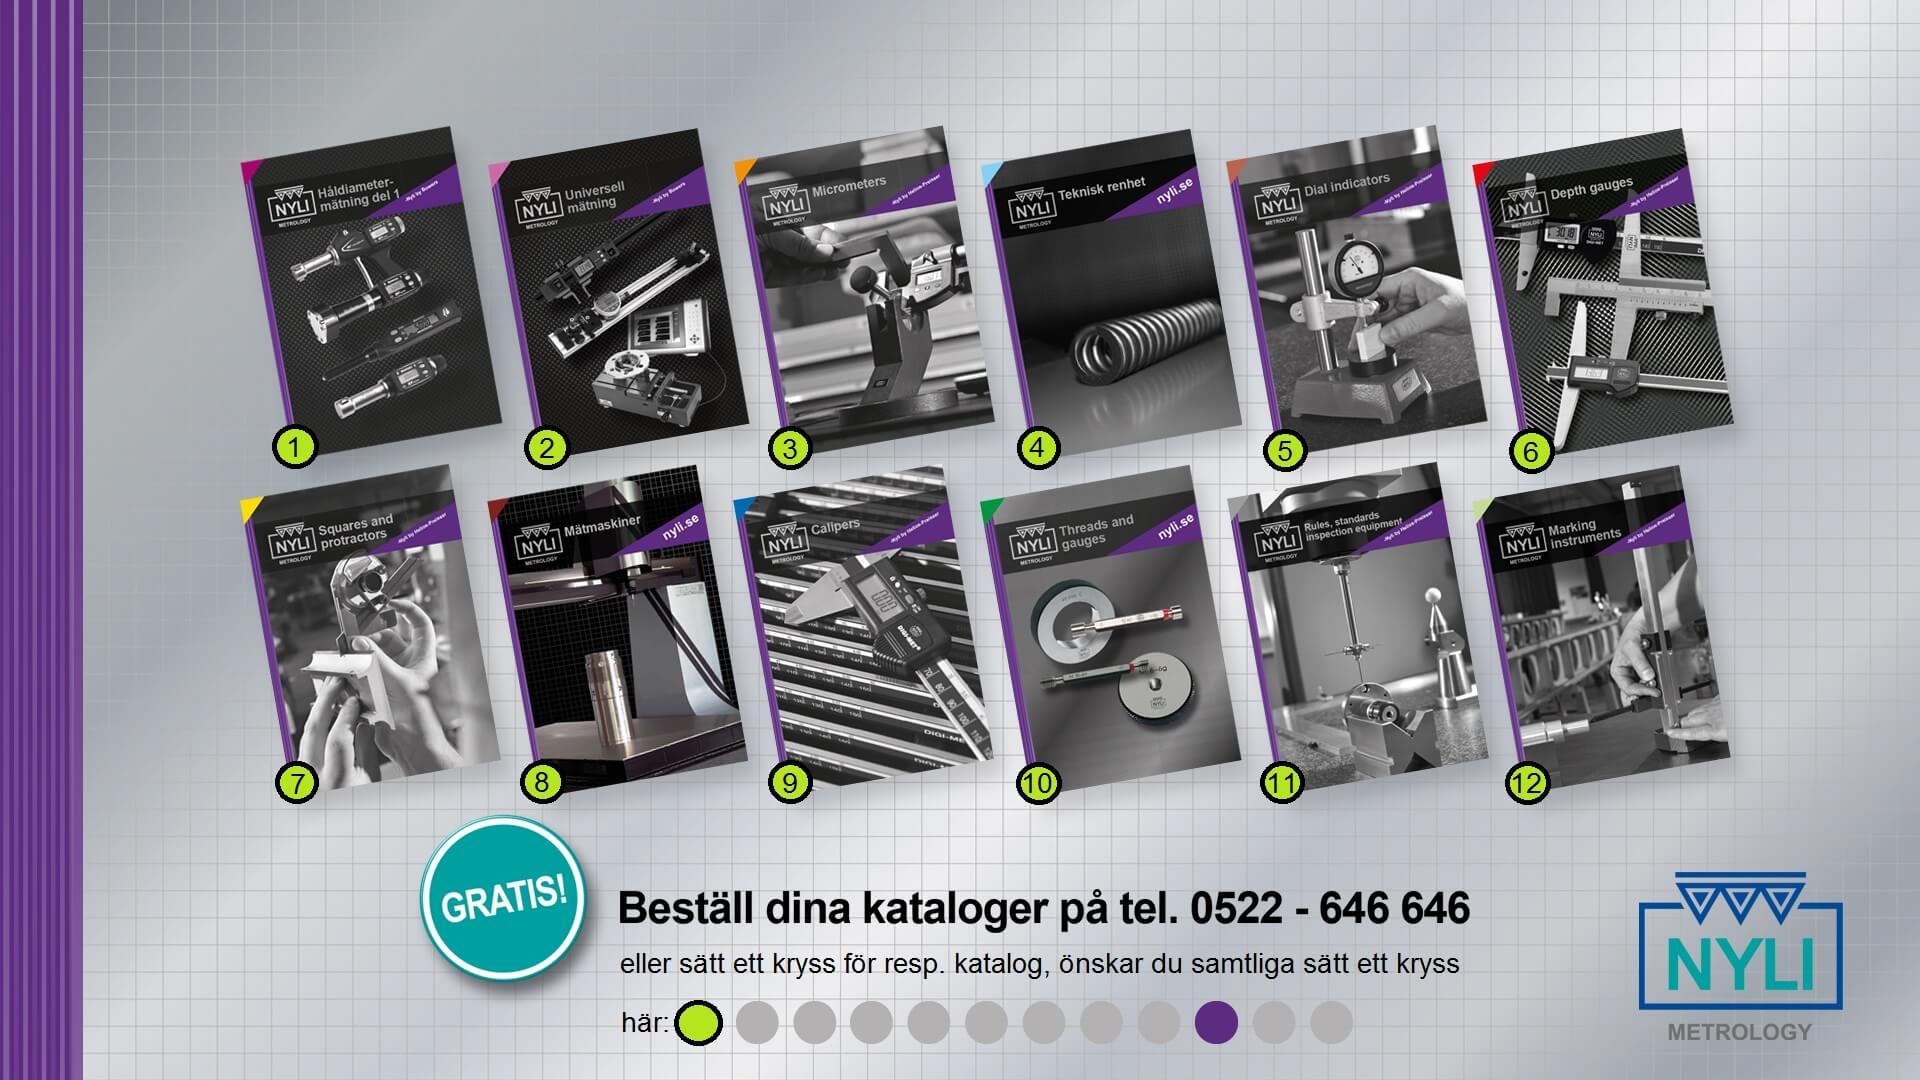 NYLI kataloger